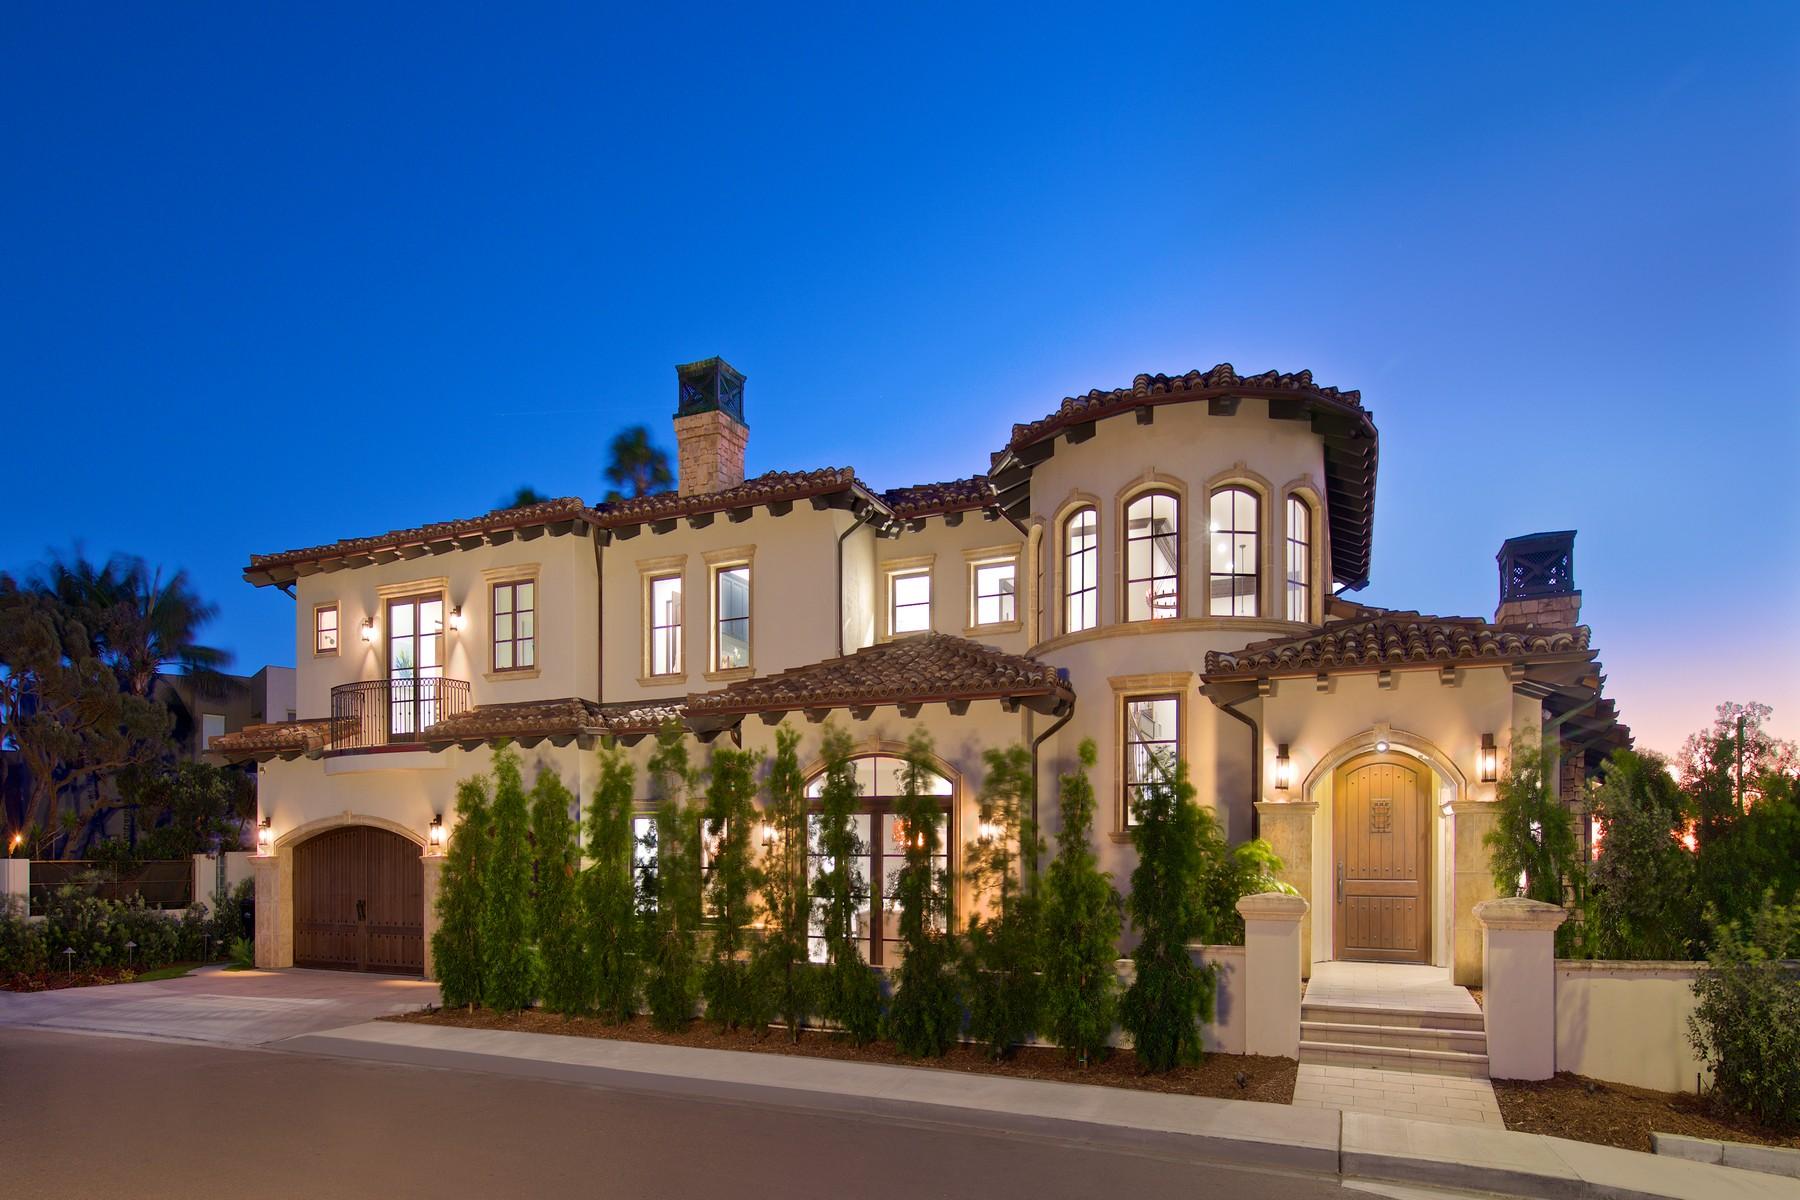 Single Family Home for Sale at 5490 Calumet Avenue La Jolla, California, 92037 United States